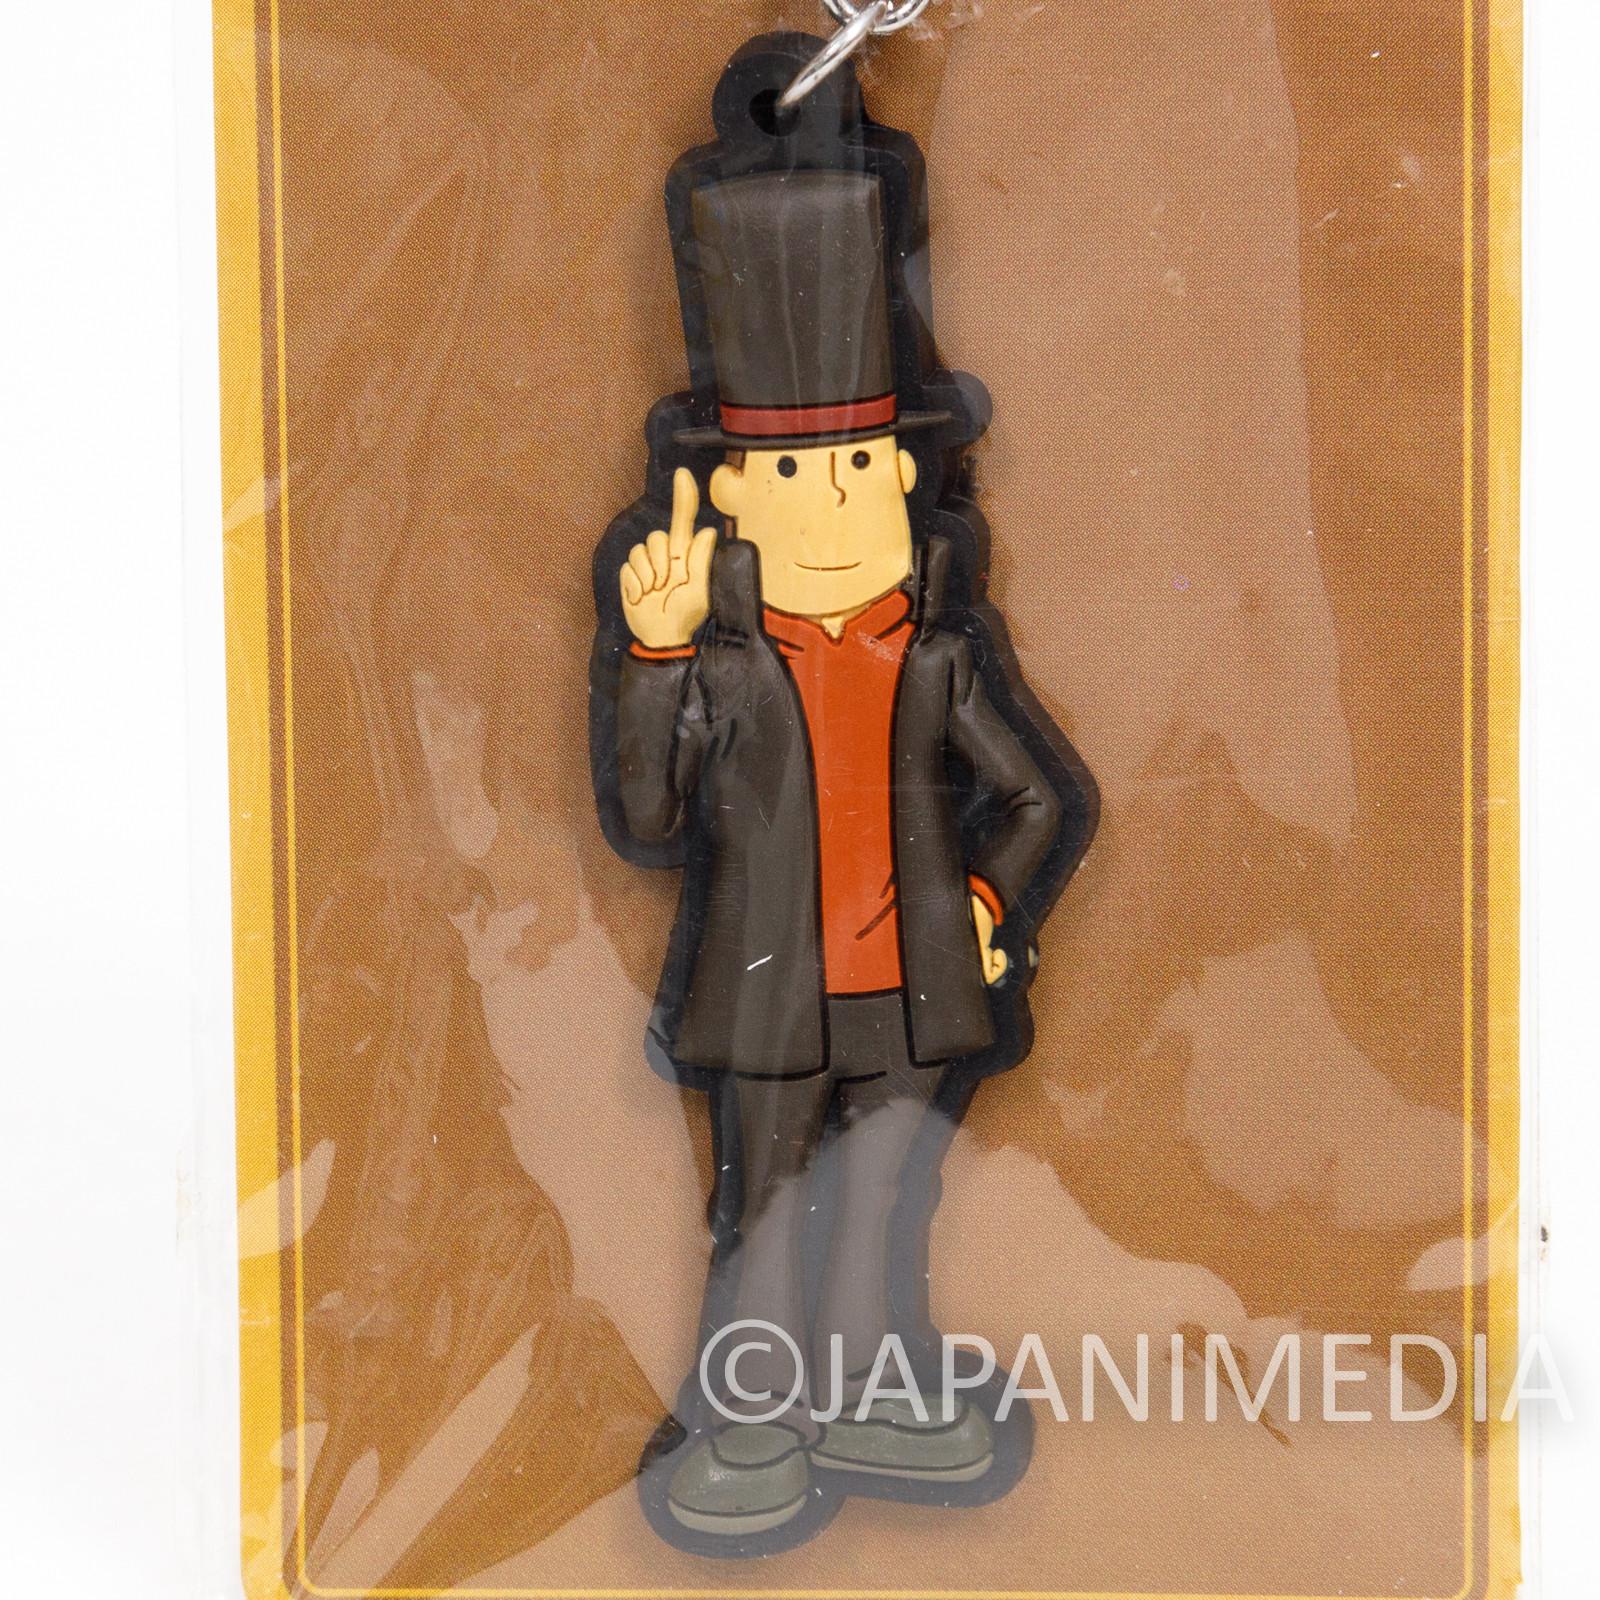 Professor Layton Rubber Mascot Keychain Nintendo DS GAME JAPAN